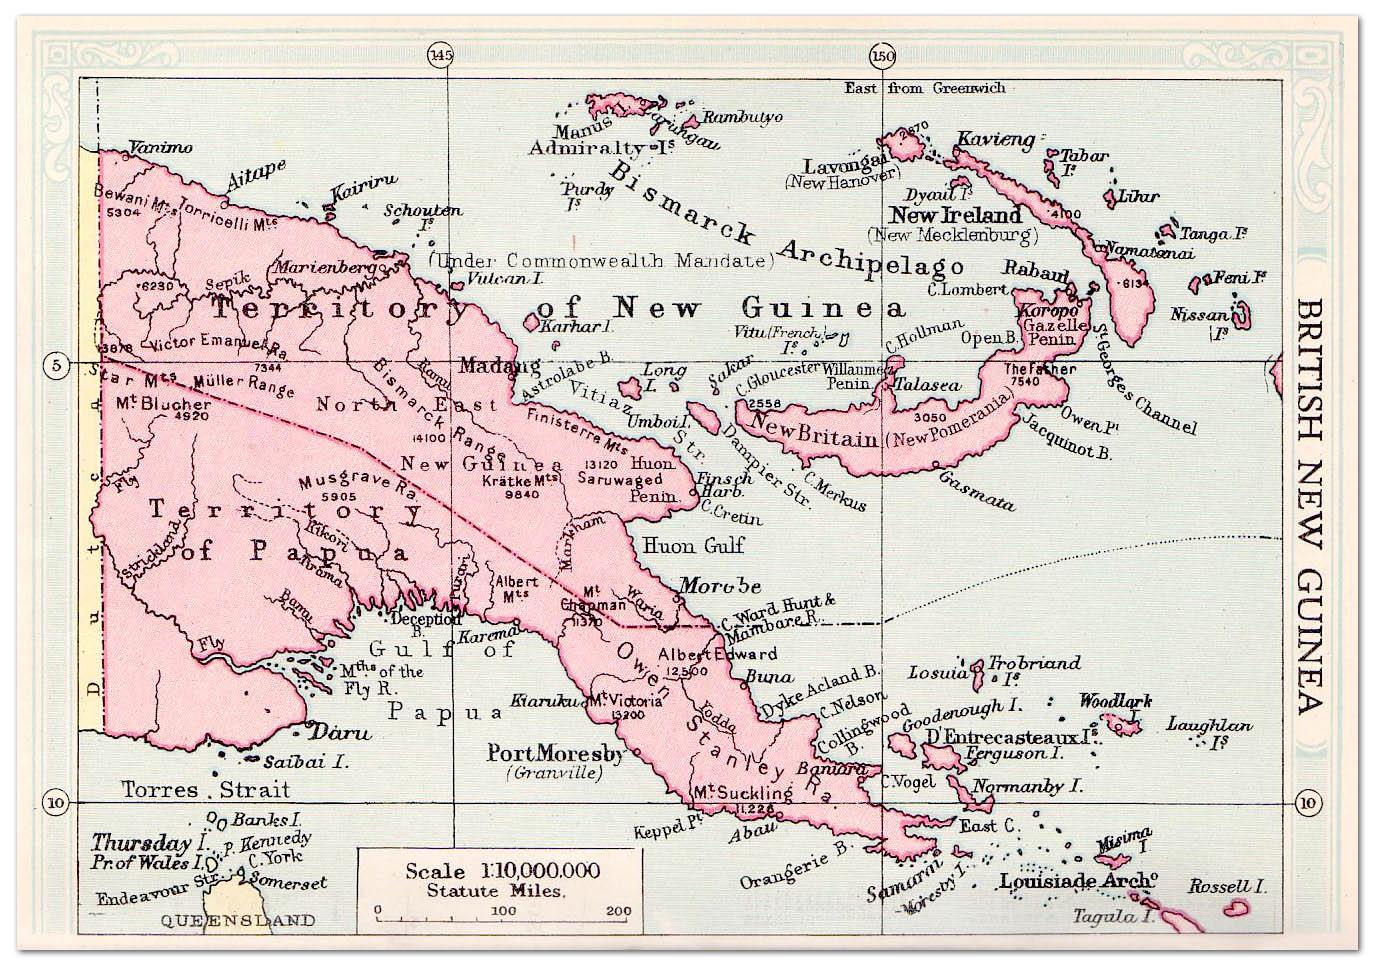 British new guinea map 1935 philatelic database british new guinea map 1935 publicscrutiny Image collections